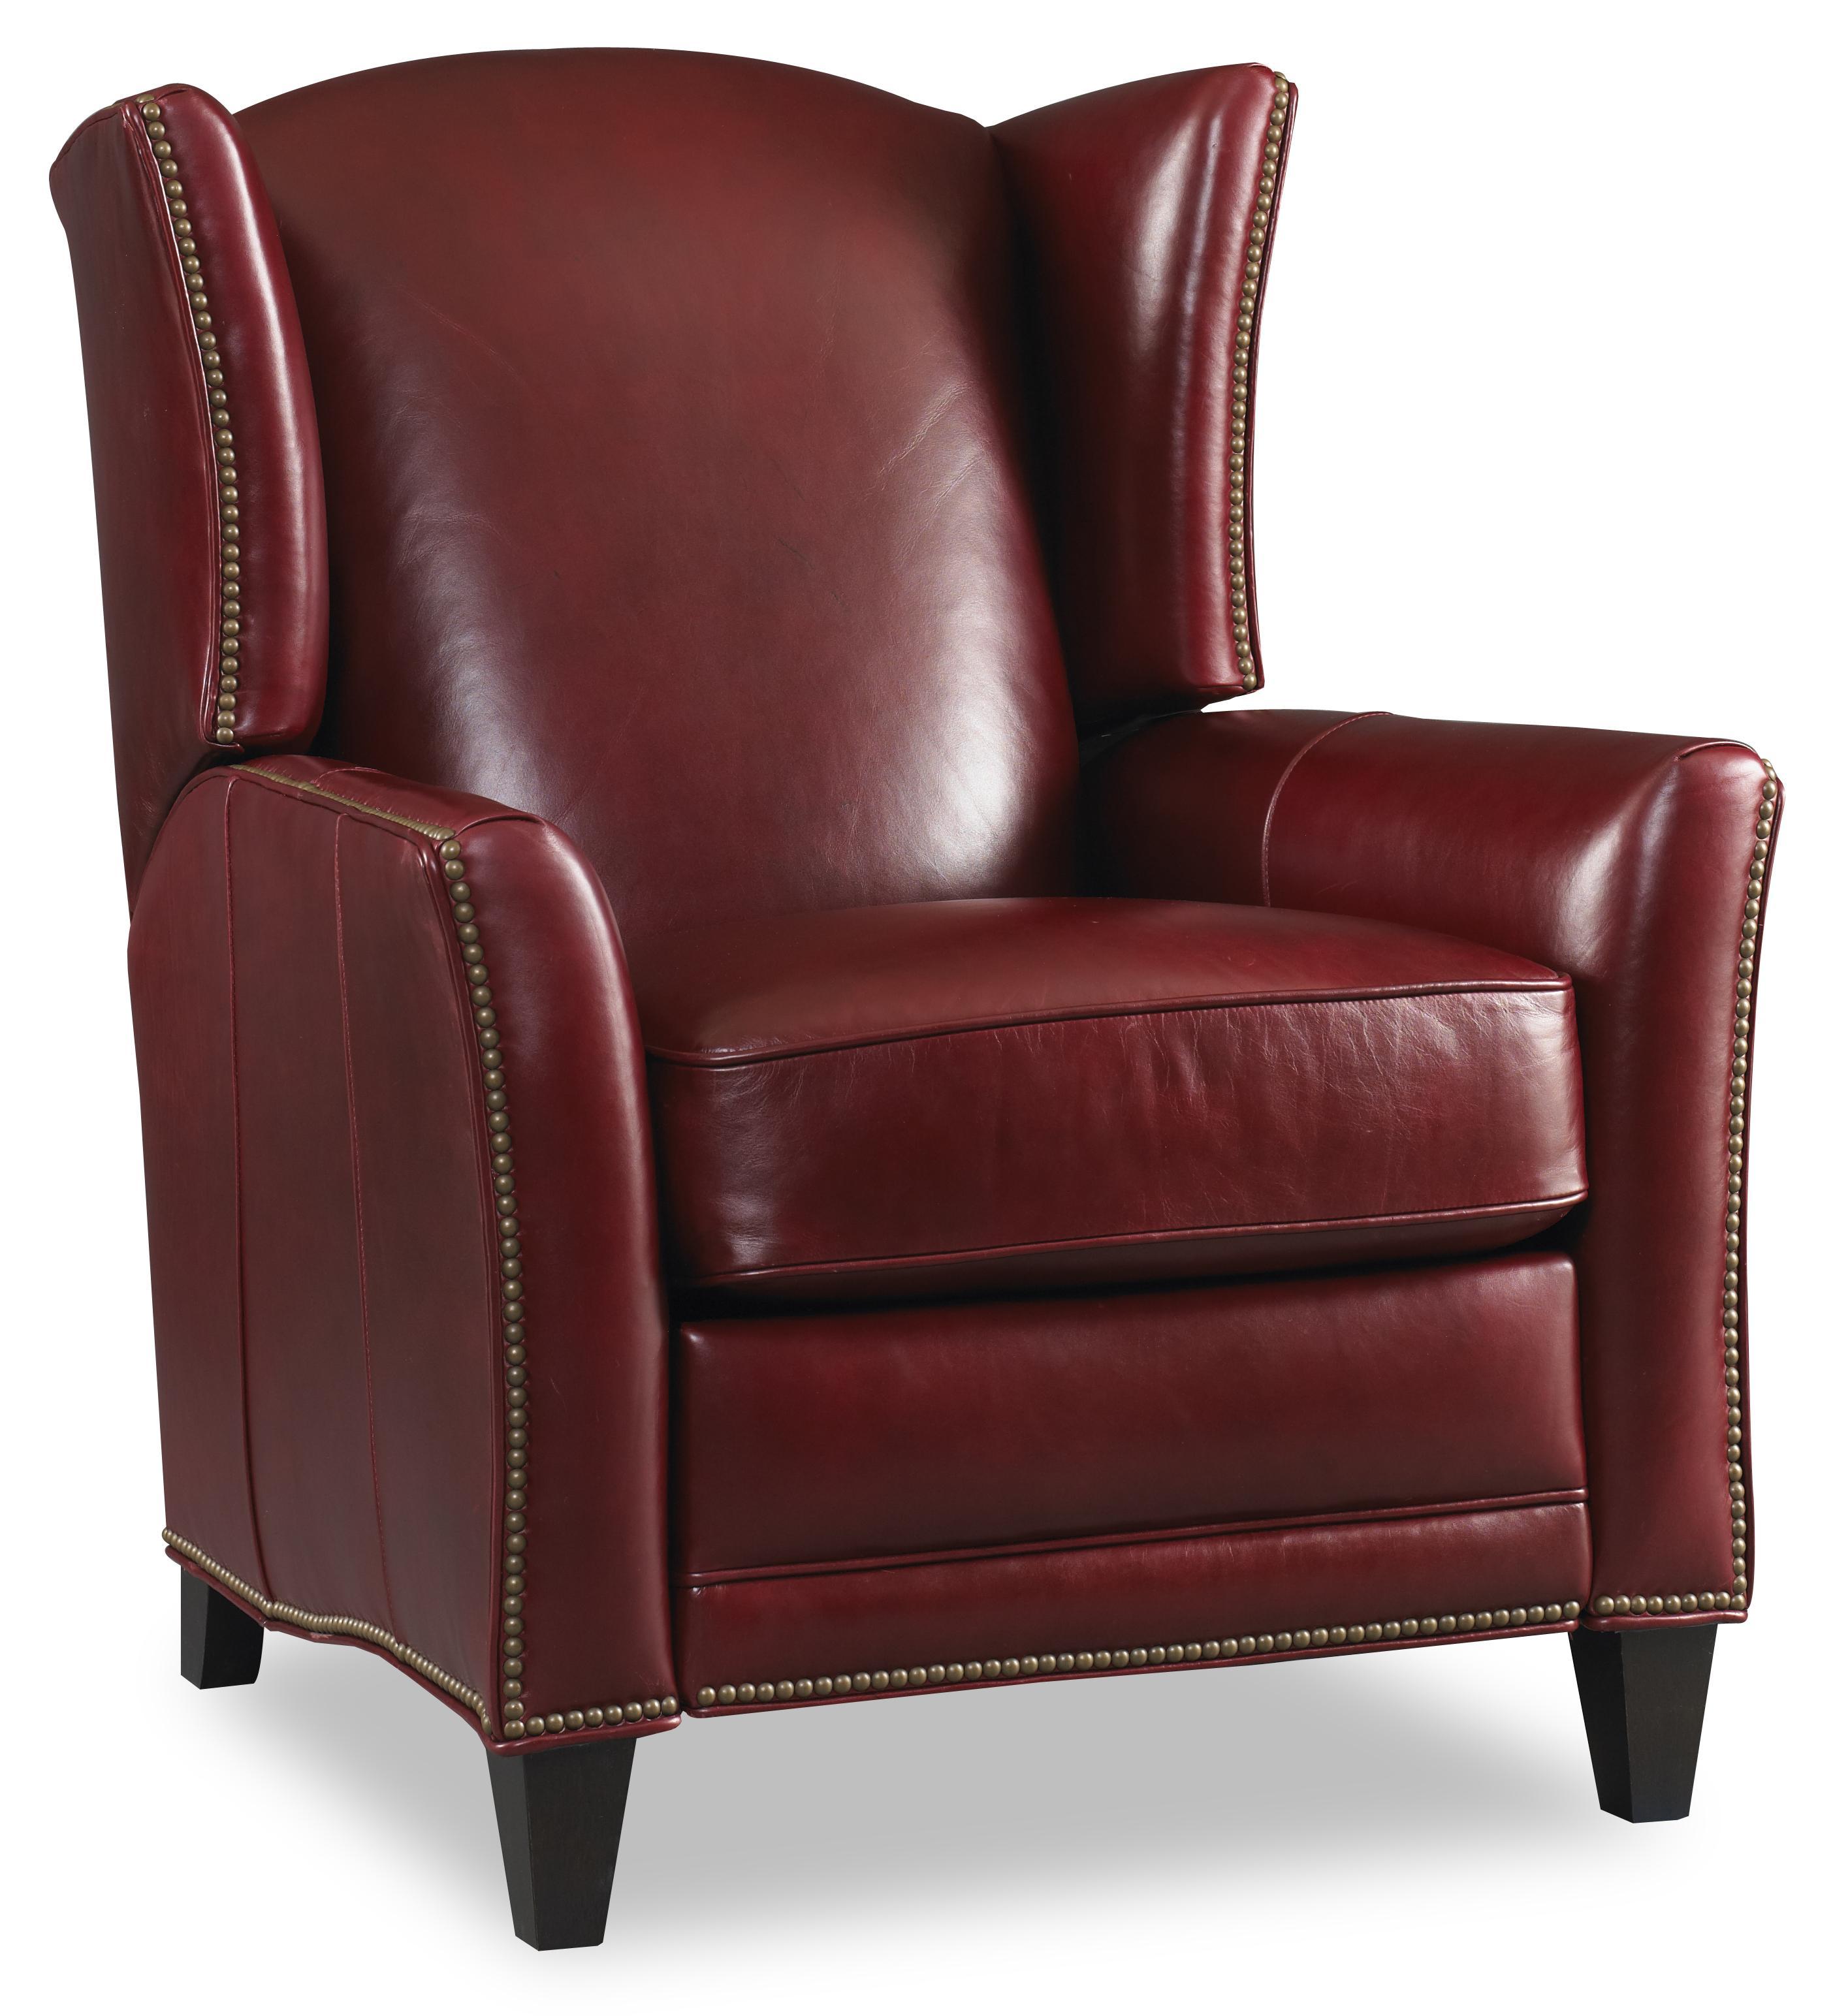 recliner design comforter comfortrecliner elliott elliot furniture modern seating comfort americanleather interior recliners